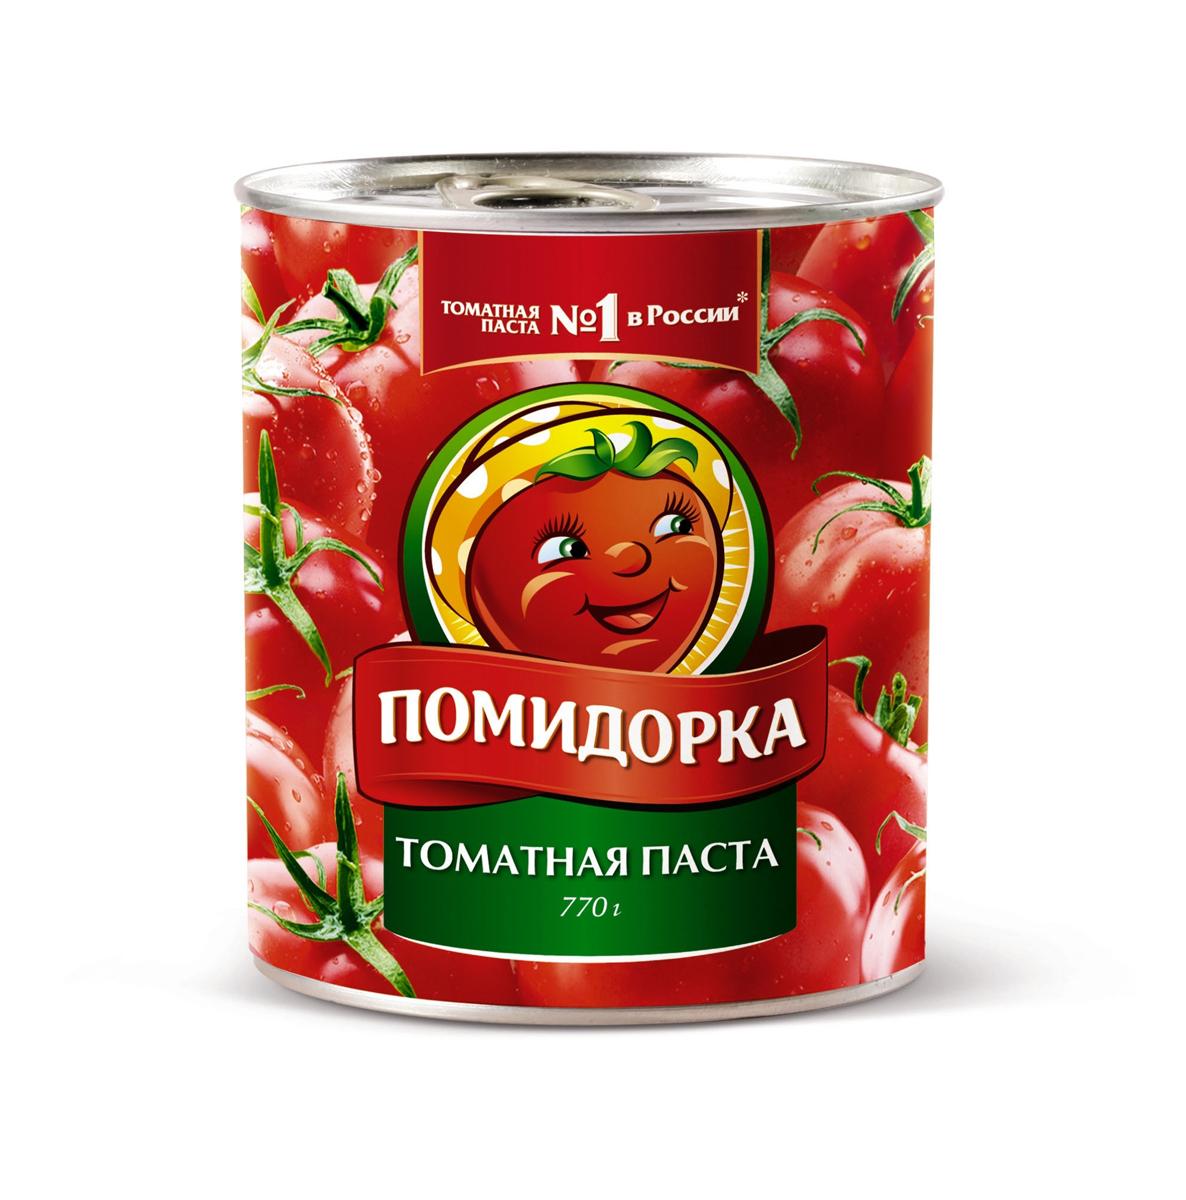 Помидорка Томатная паста, 770 г тони моли томатная